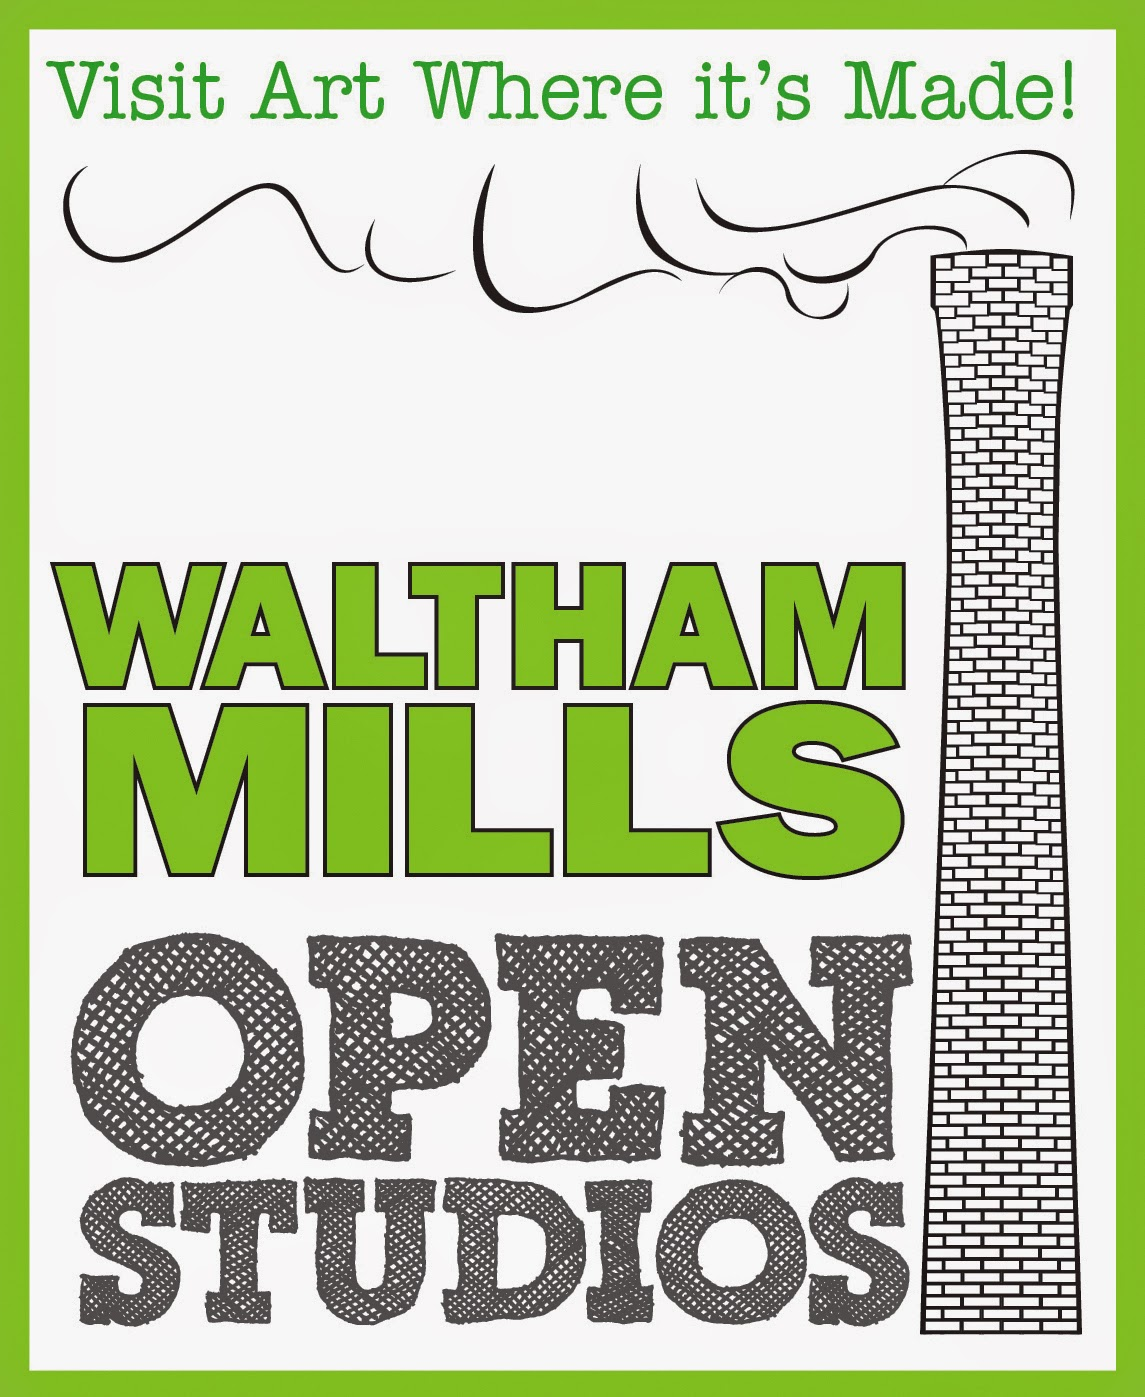 Annual Open Studios